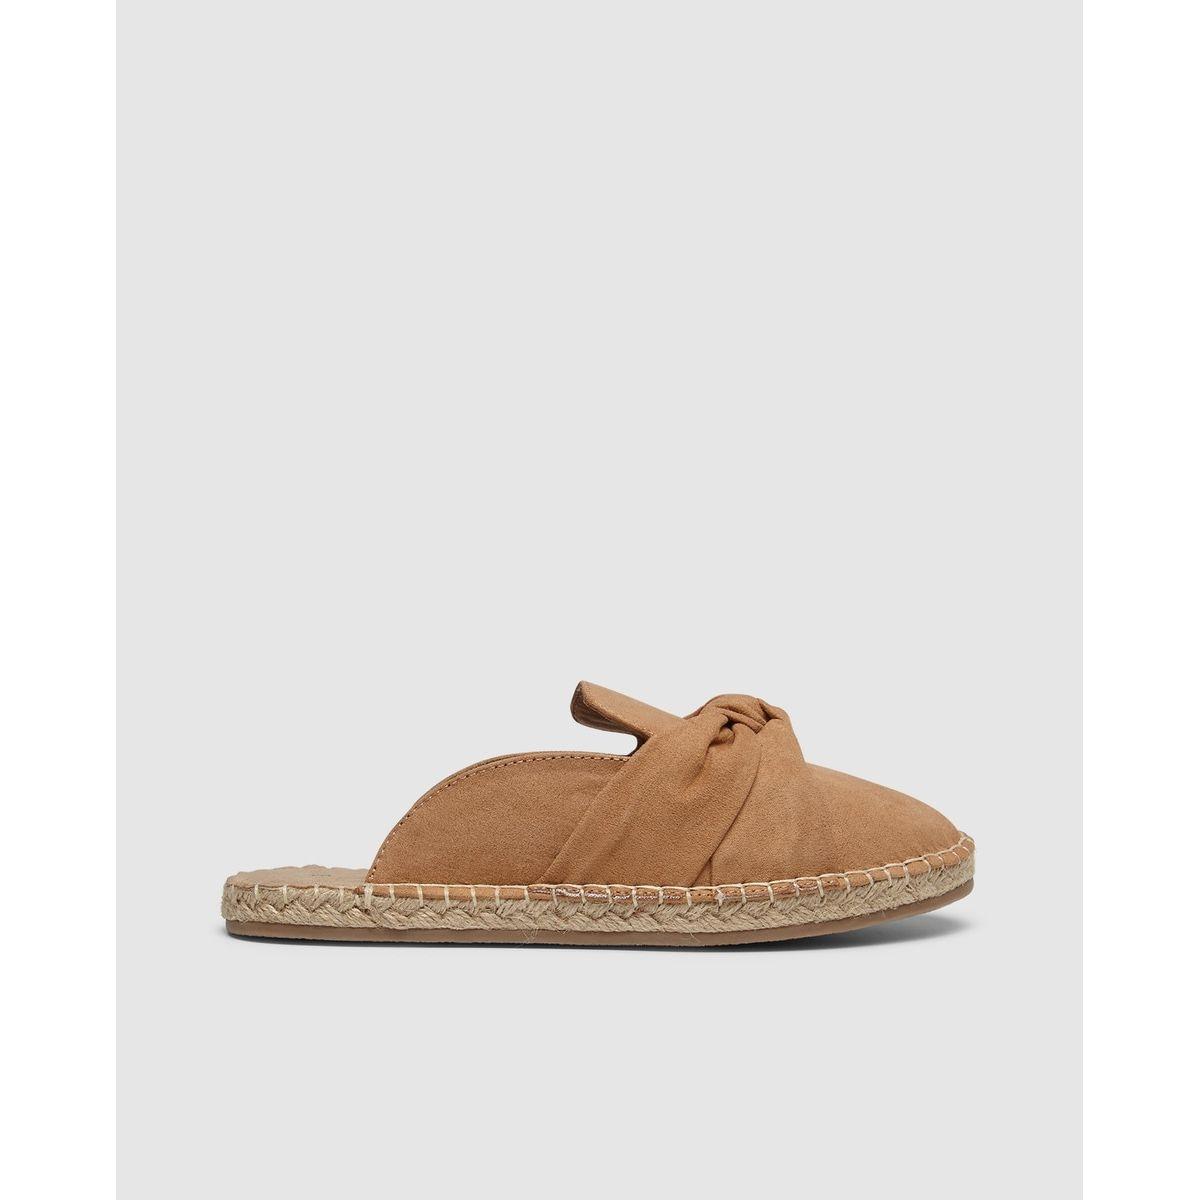 Sandales jute type mules